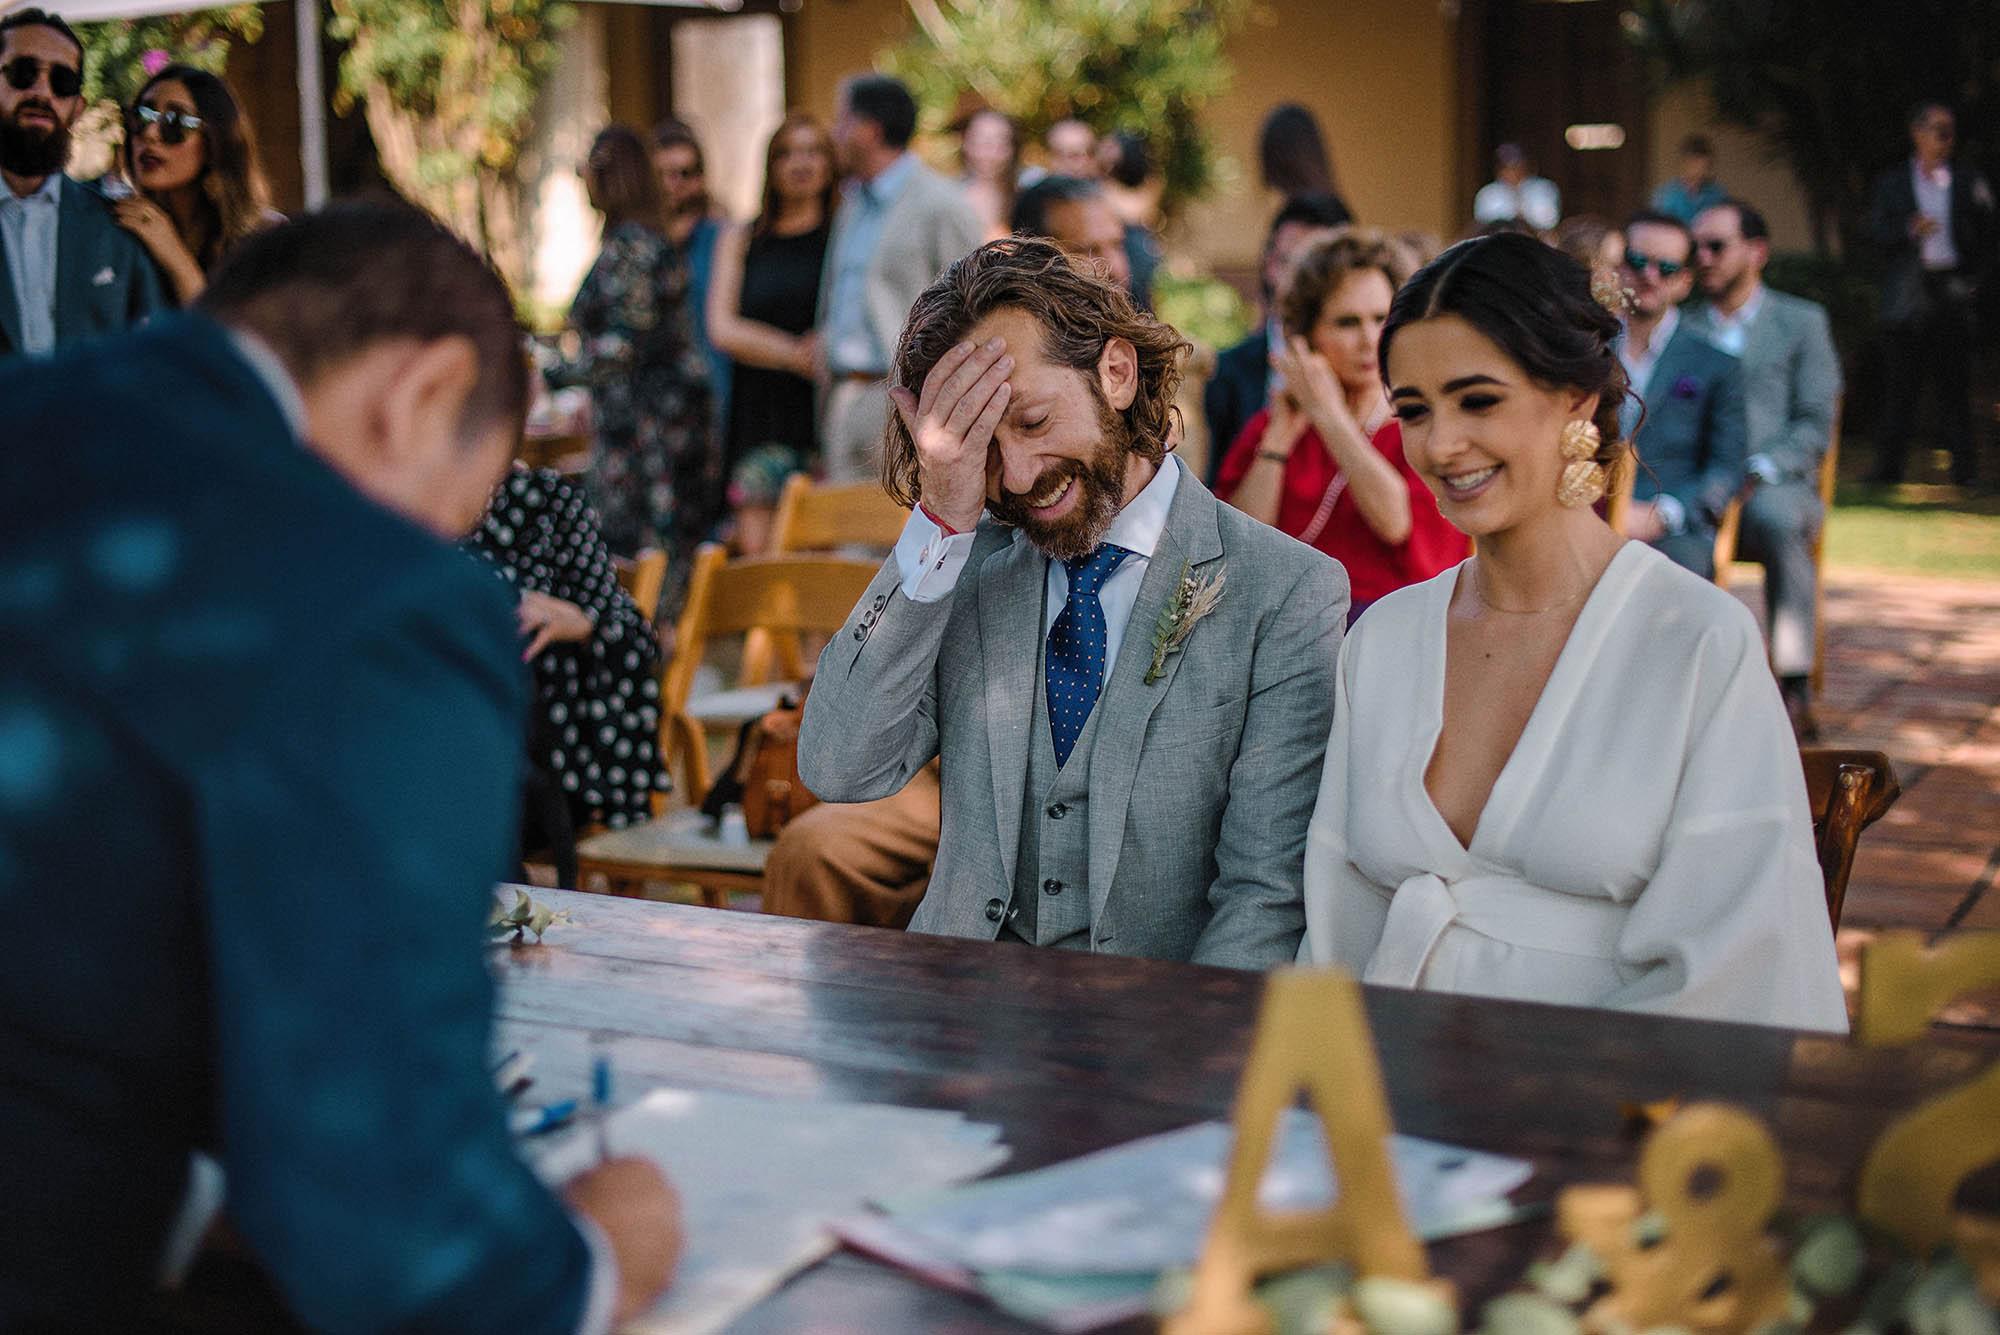 magali espinosa fotografo guadalajara boda huaxtla hacienda 11.jpg